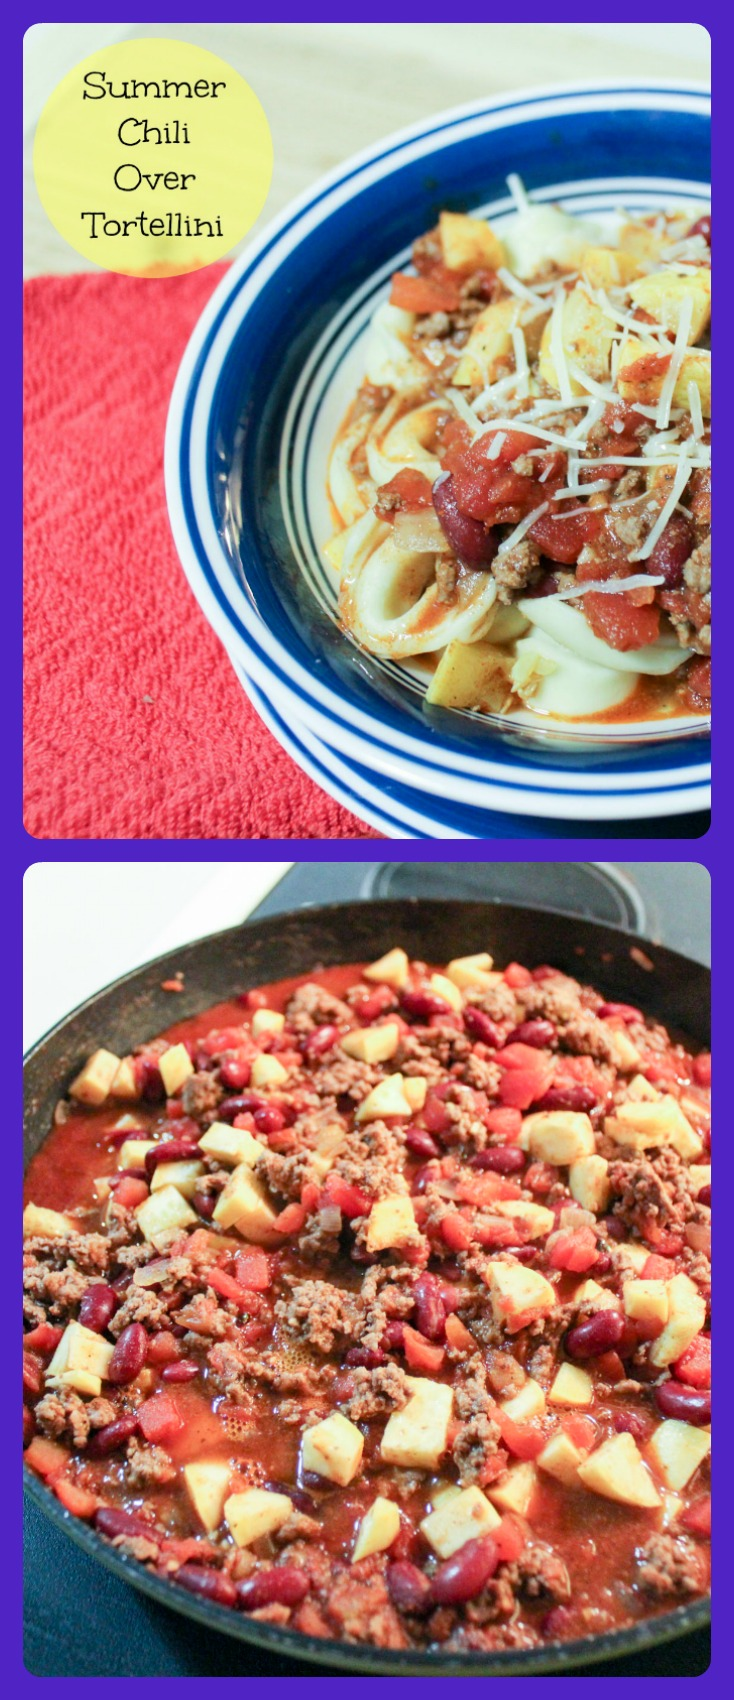 Summer Chili Over Tortellini Collage